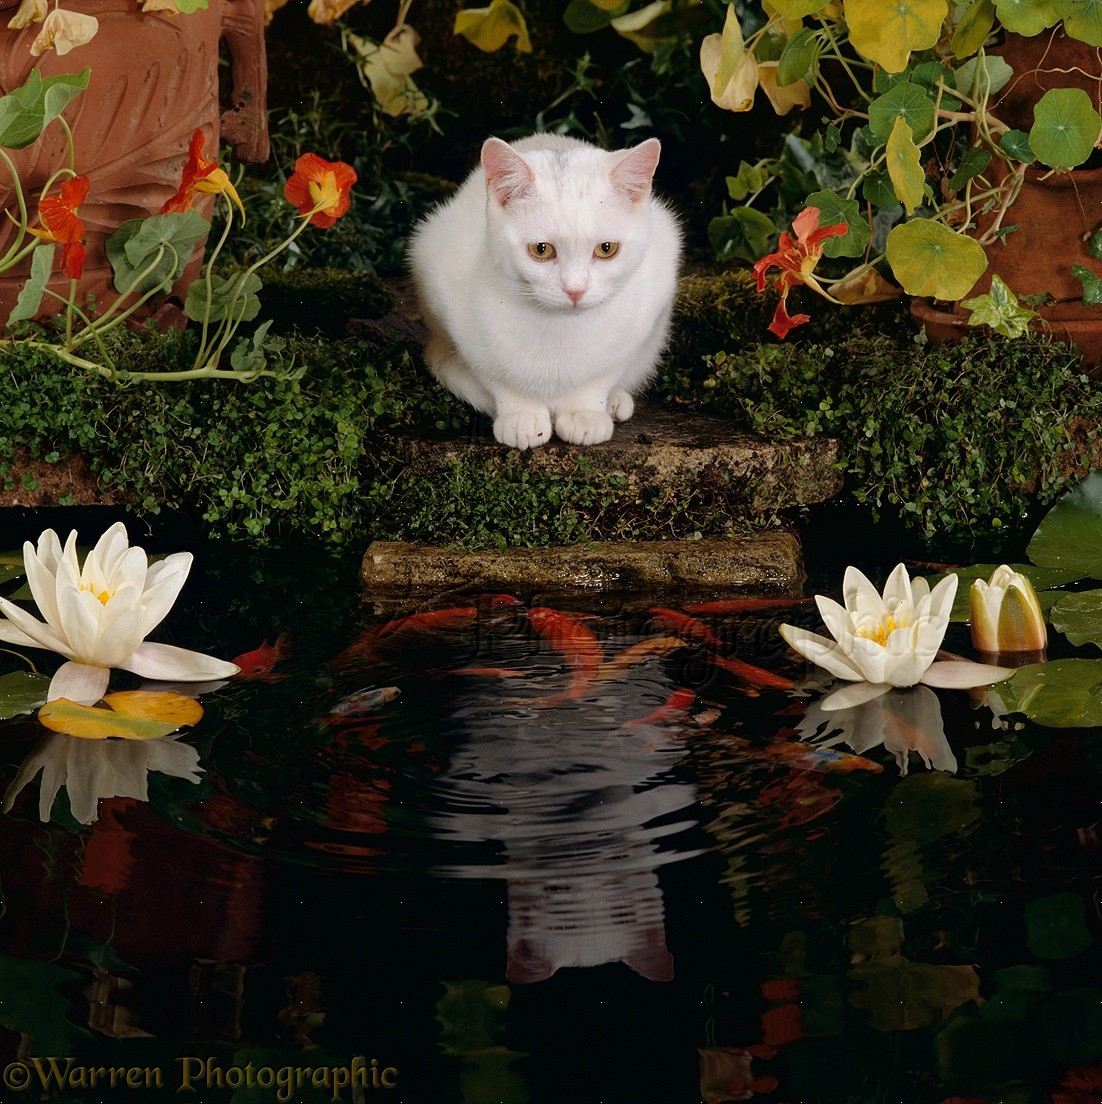 White Cat Watching Goldfish In Garden Pond Photo WP16705